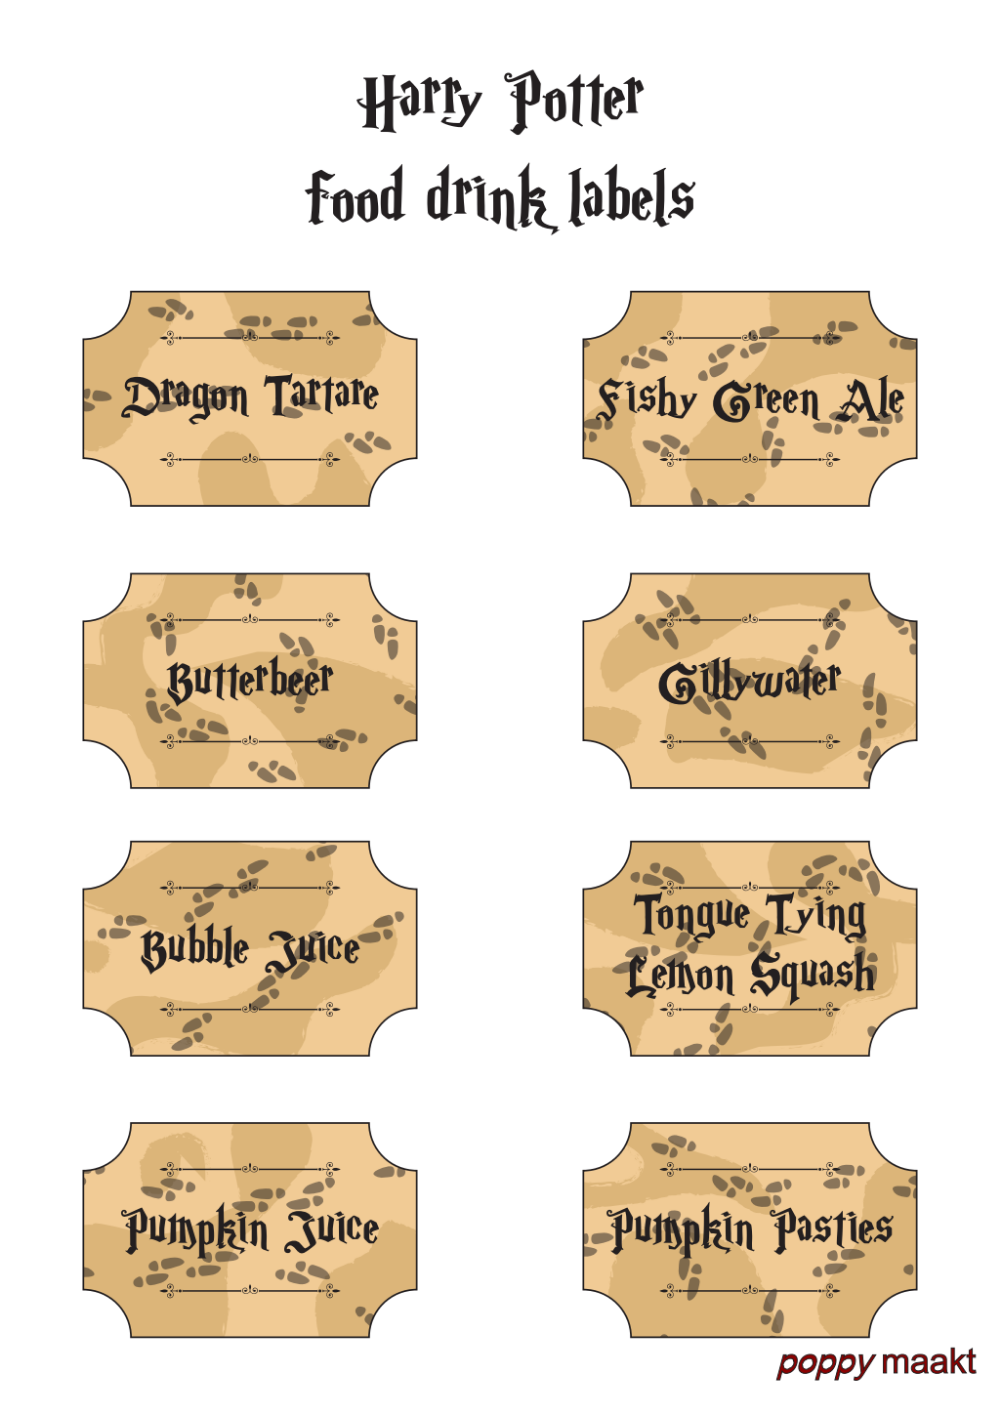 Hpfooddrinklabels Pdf Google Drive Harry Potter Candy Harry Potter Birthday Harry Potter Food